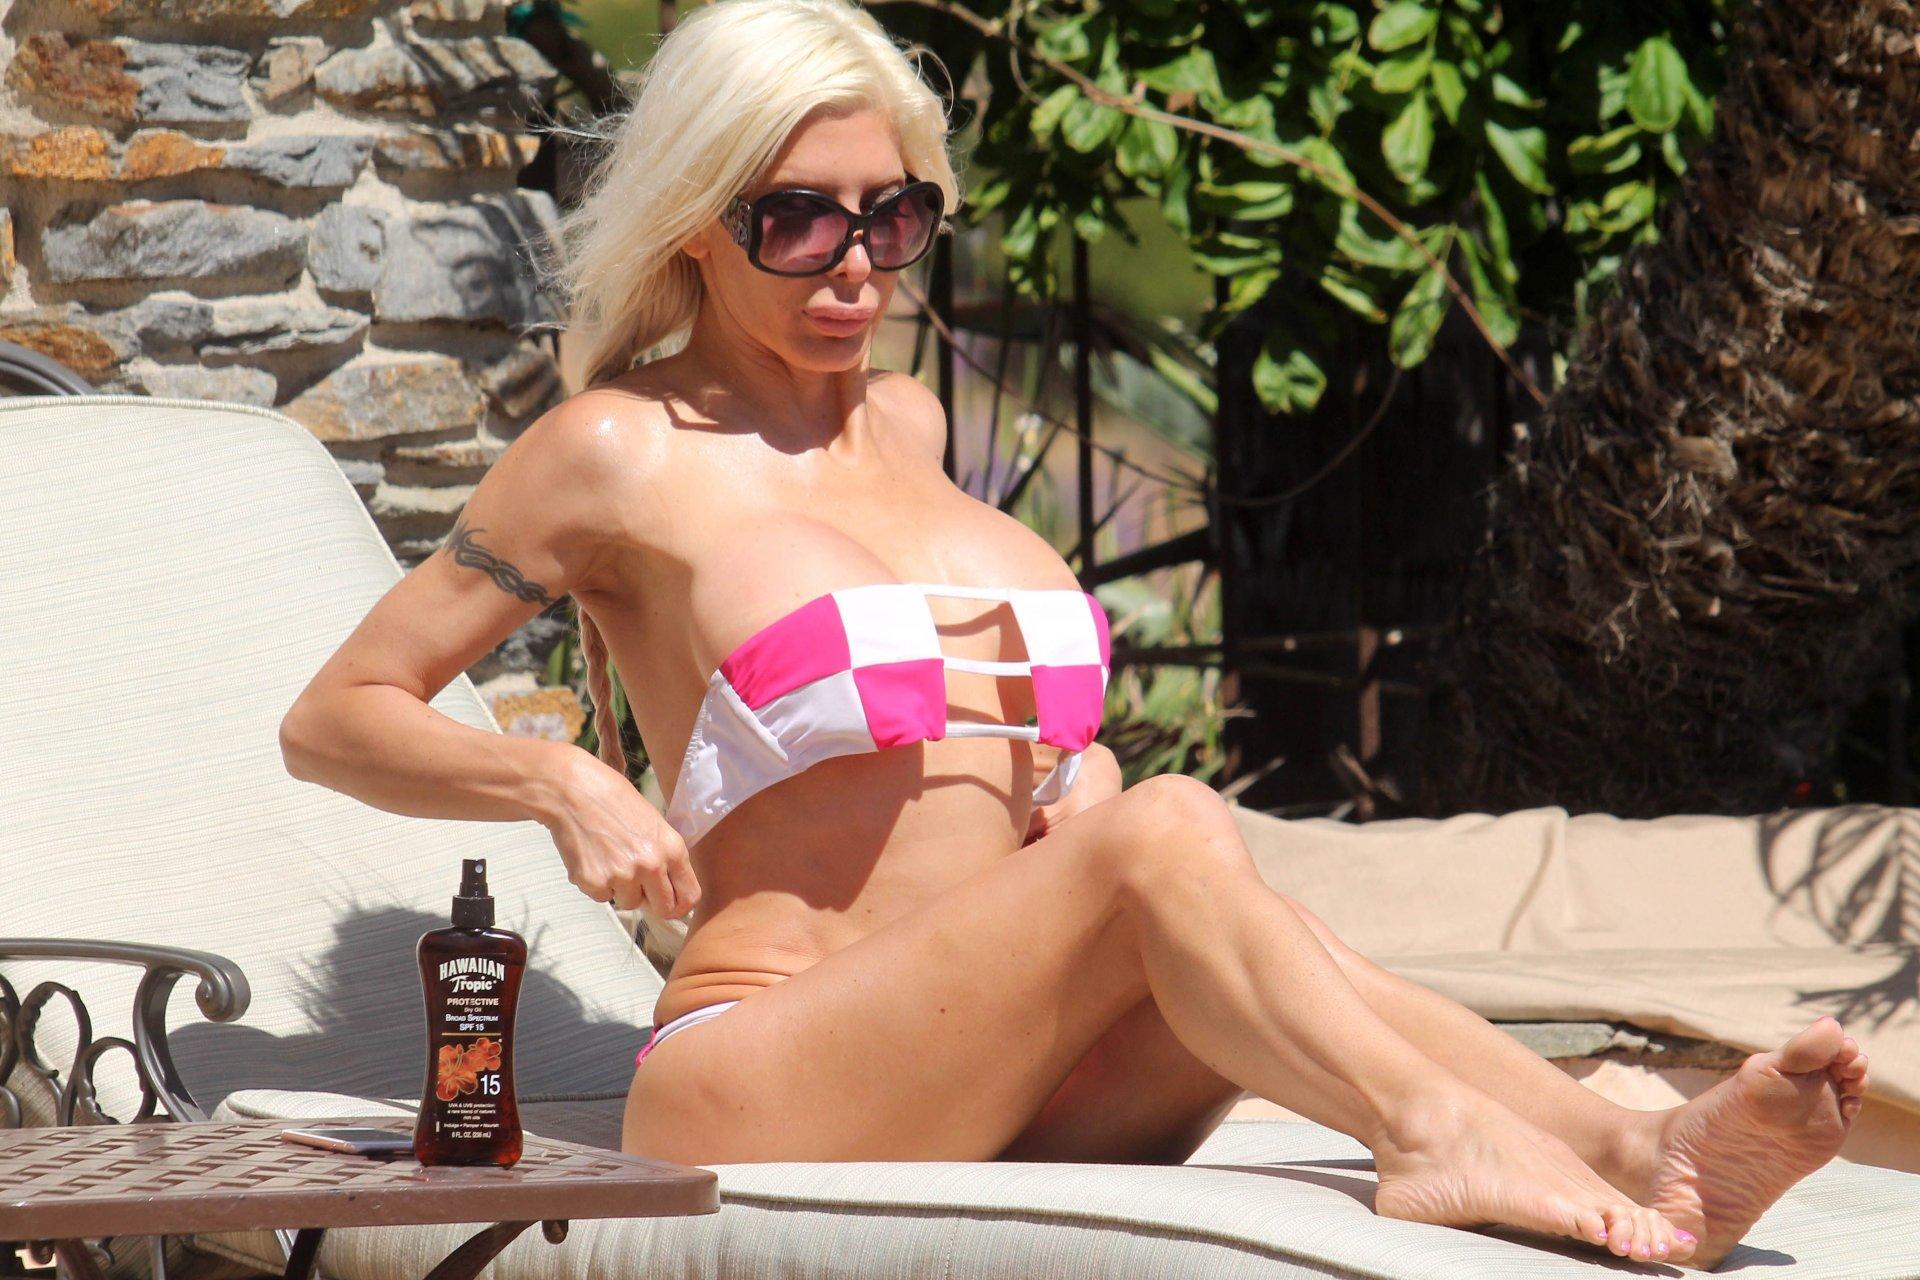 Jordan capozzi 2019 Sex image Dianna Agron Erotic,Cardi b close up 4